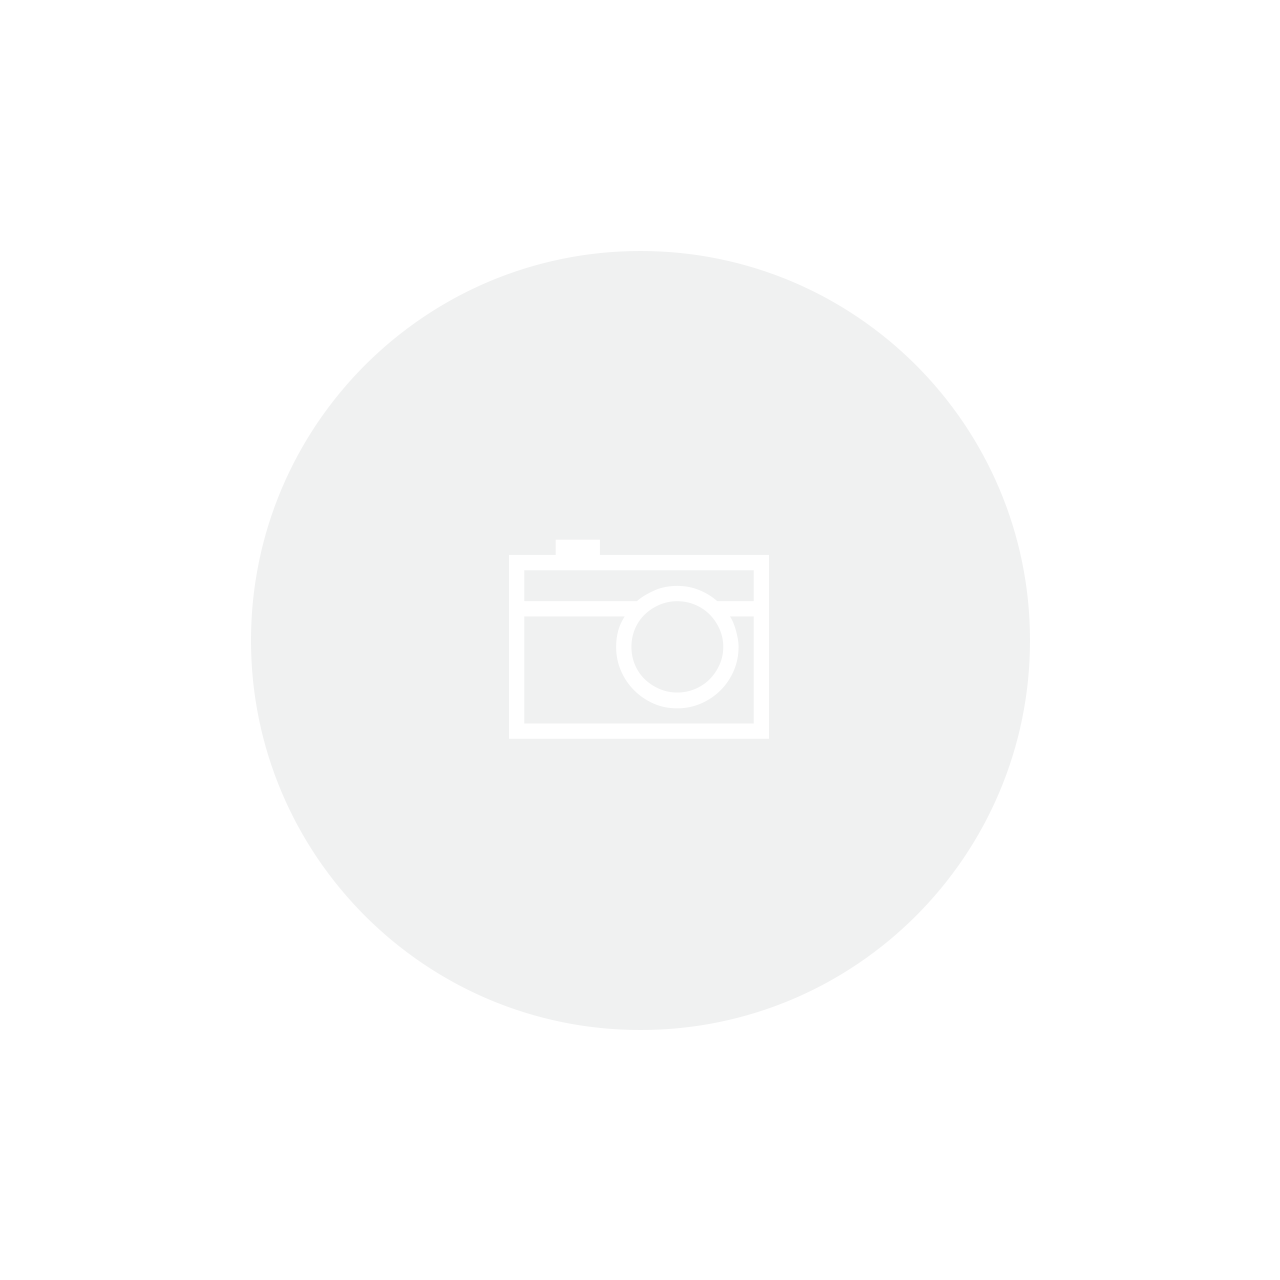 Batedor Manual em Nylon Preto Utilità Tramontina